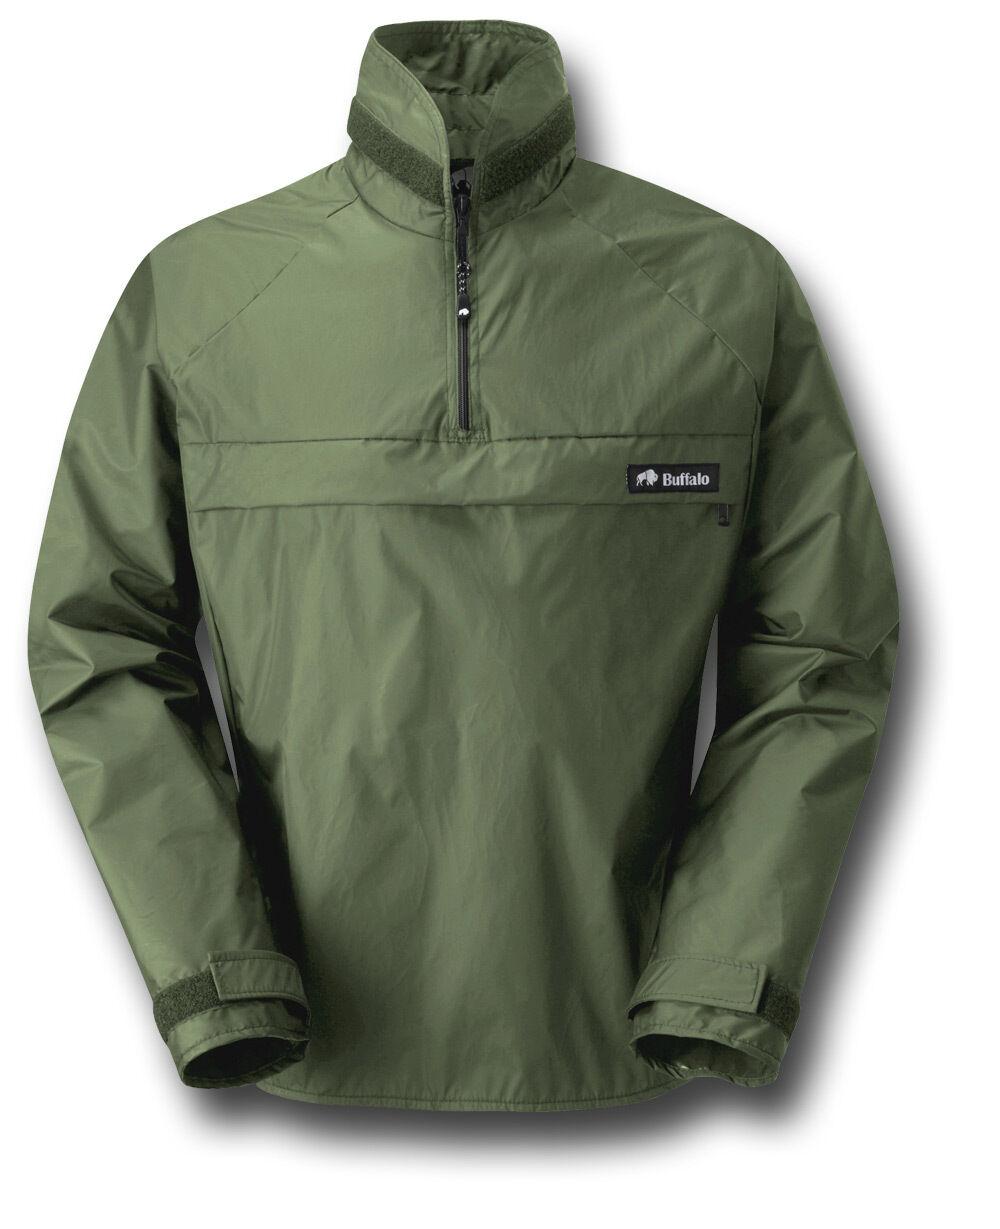 Buffalo Pertex Windshirt a prueba de viento Sin Forro, verde O Negro [70189]